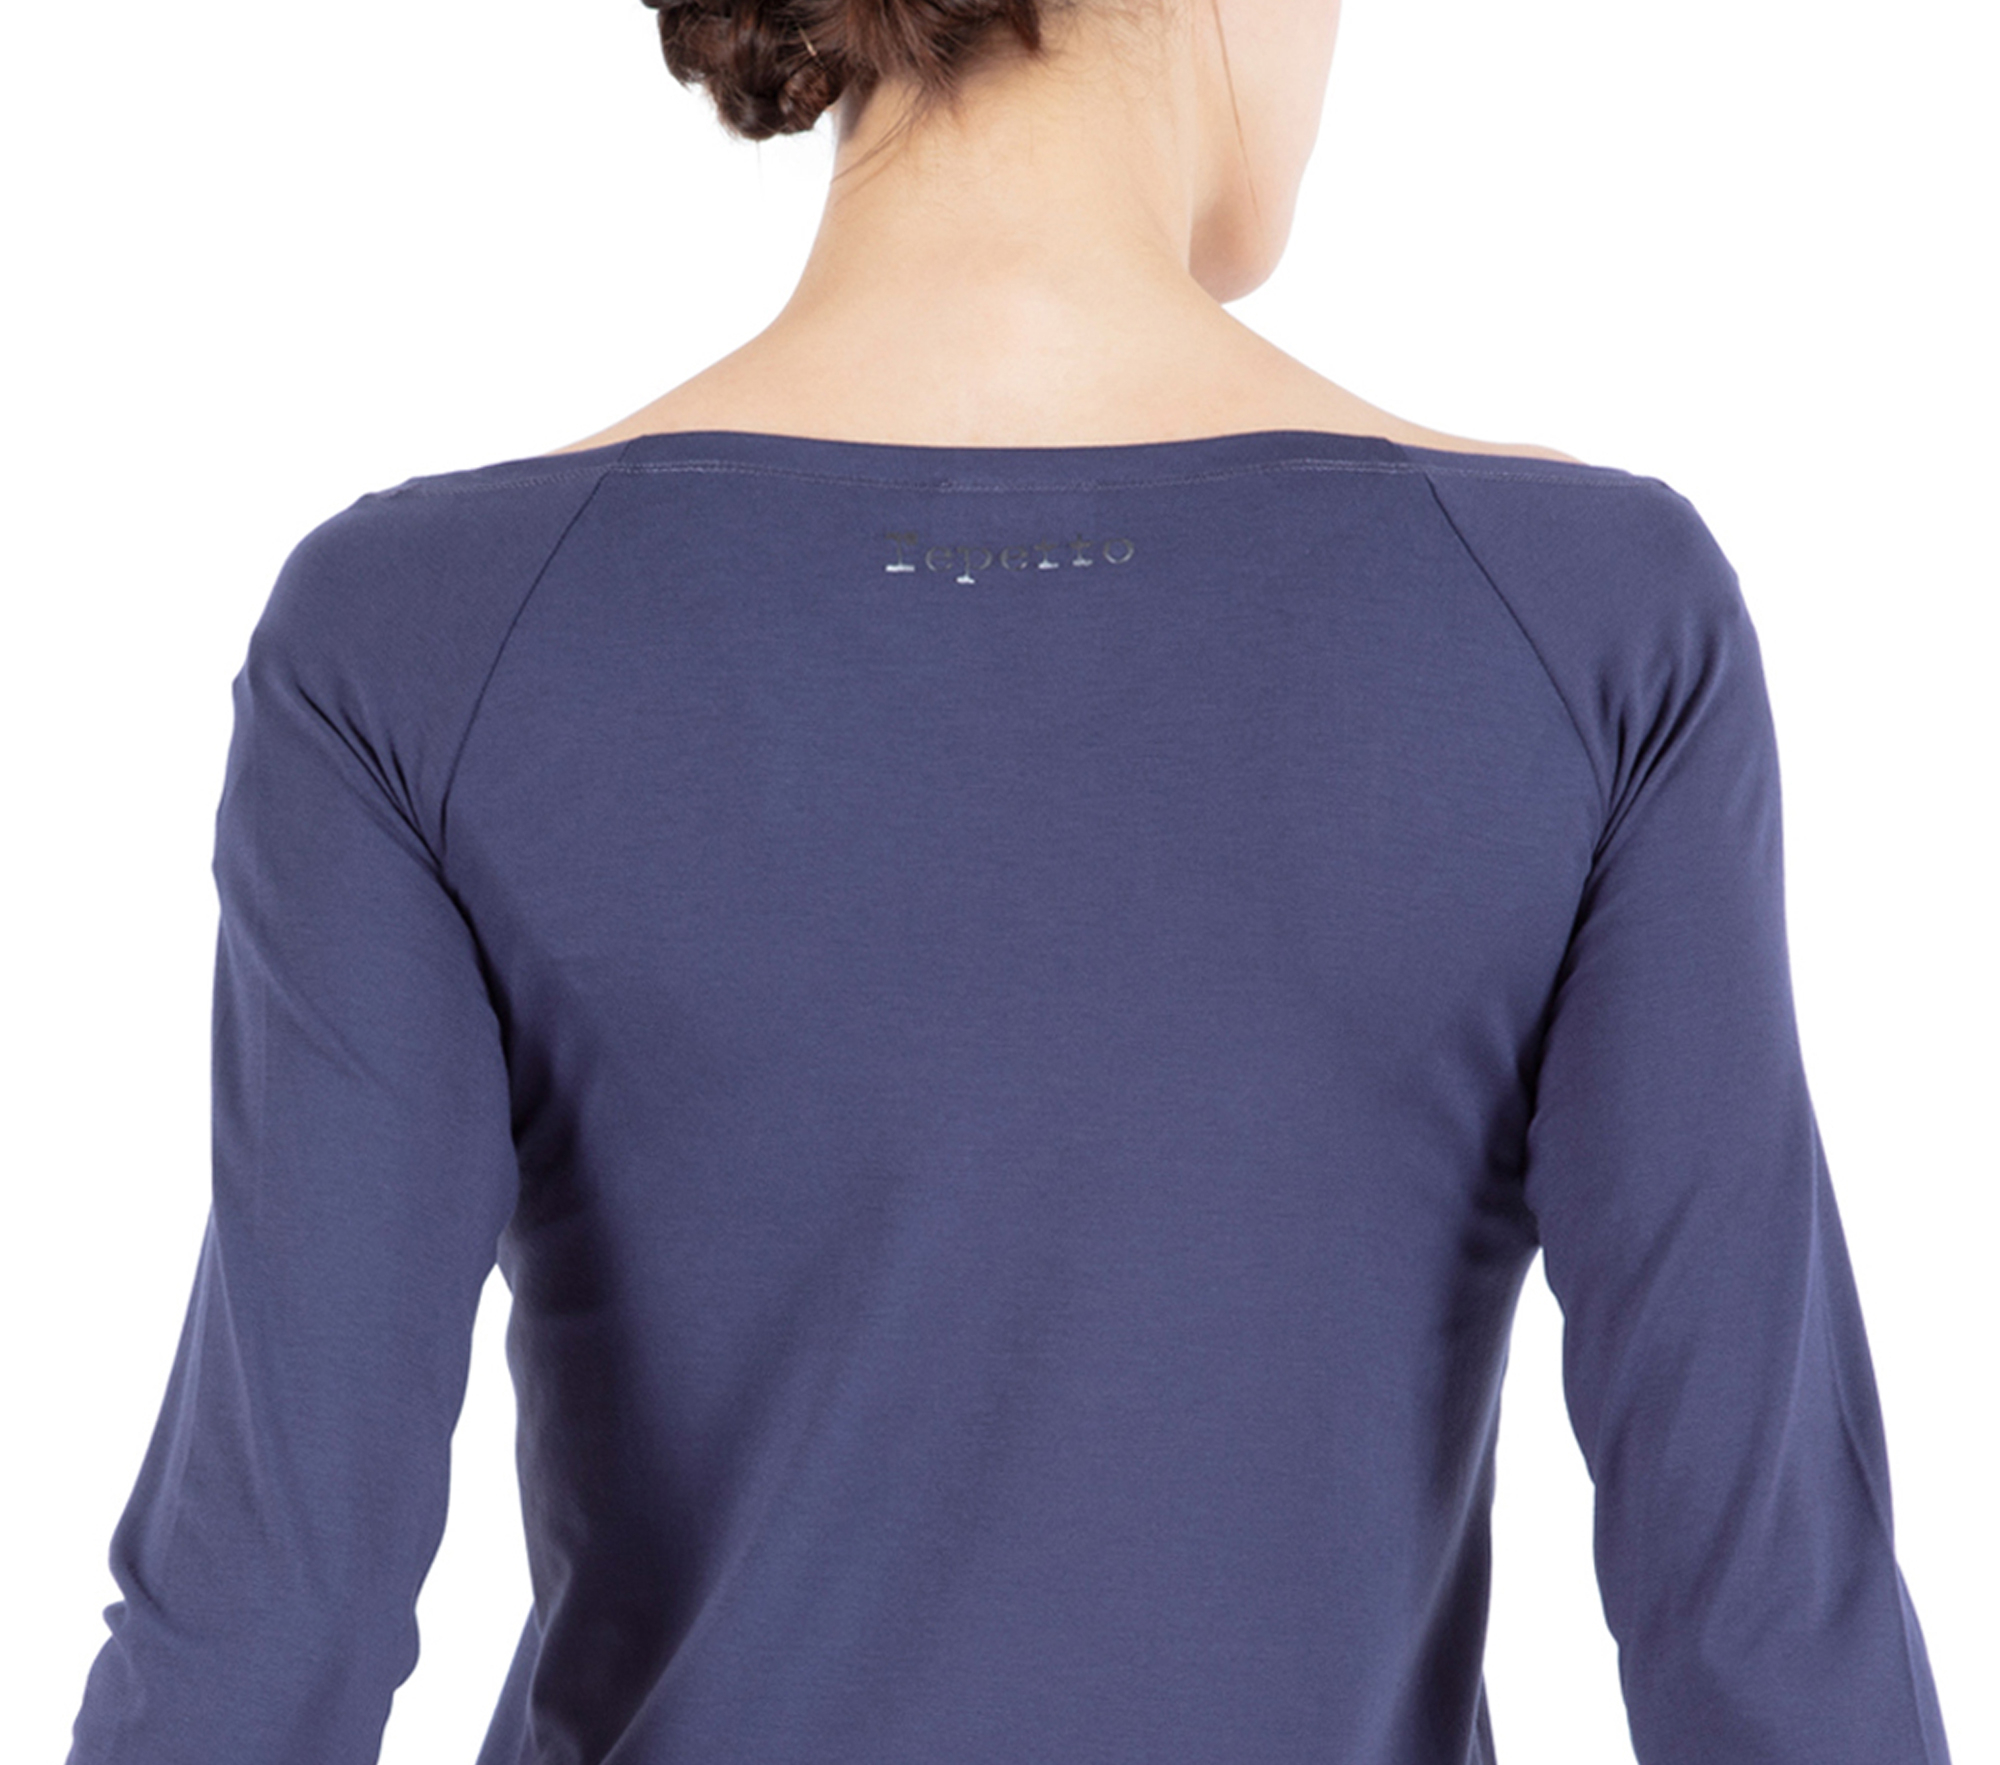 Ballerina neckline top